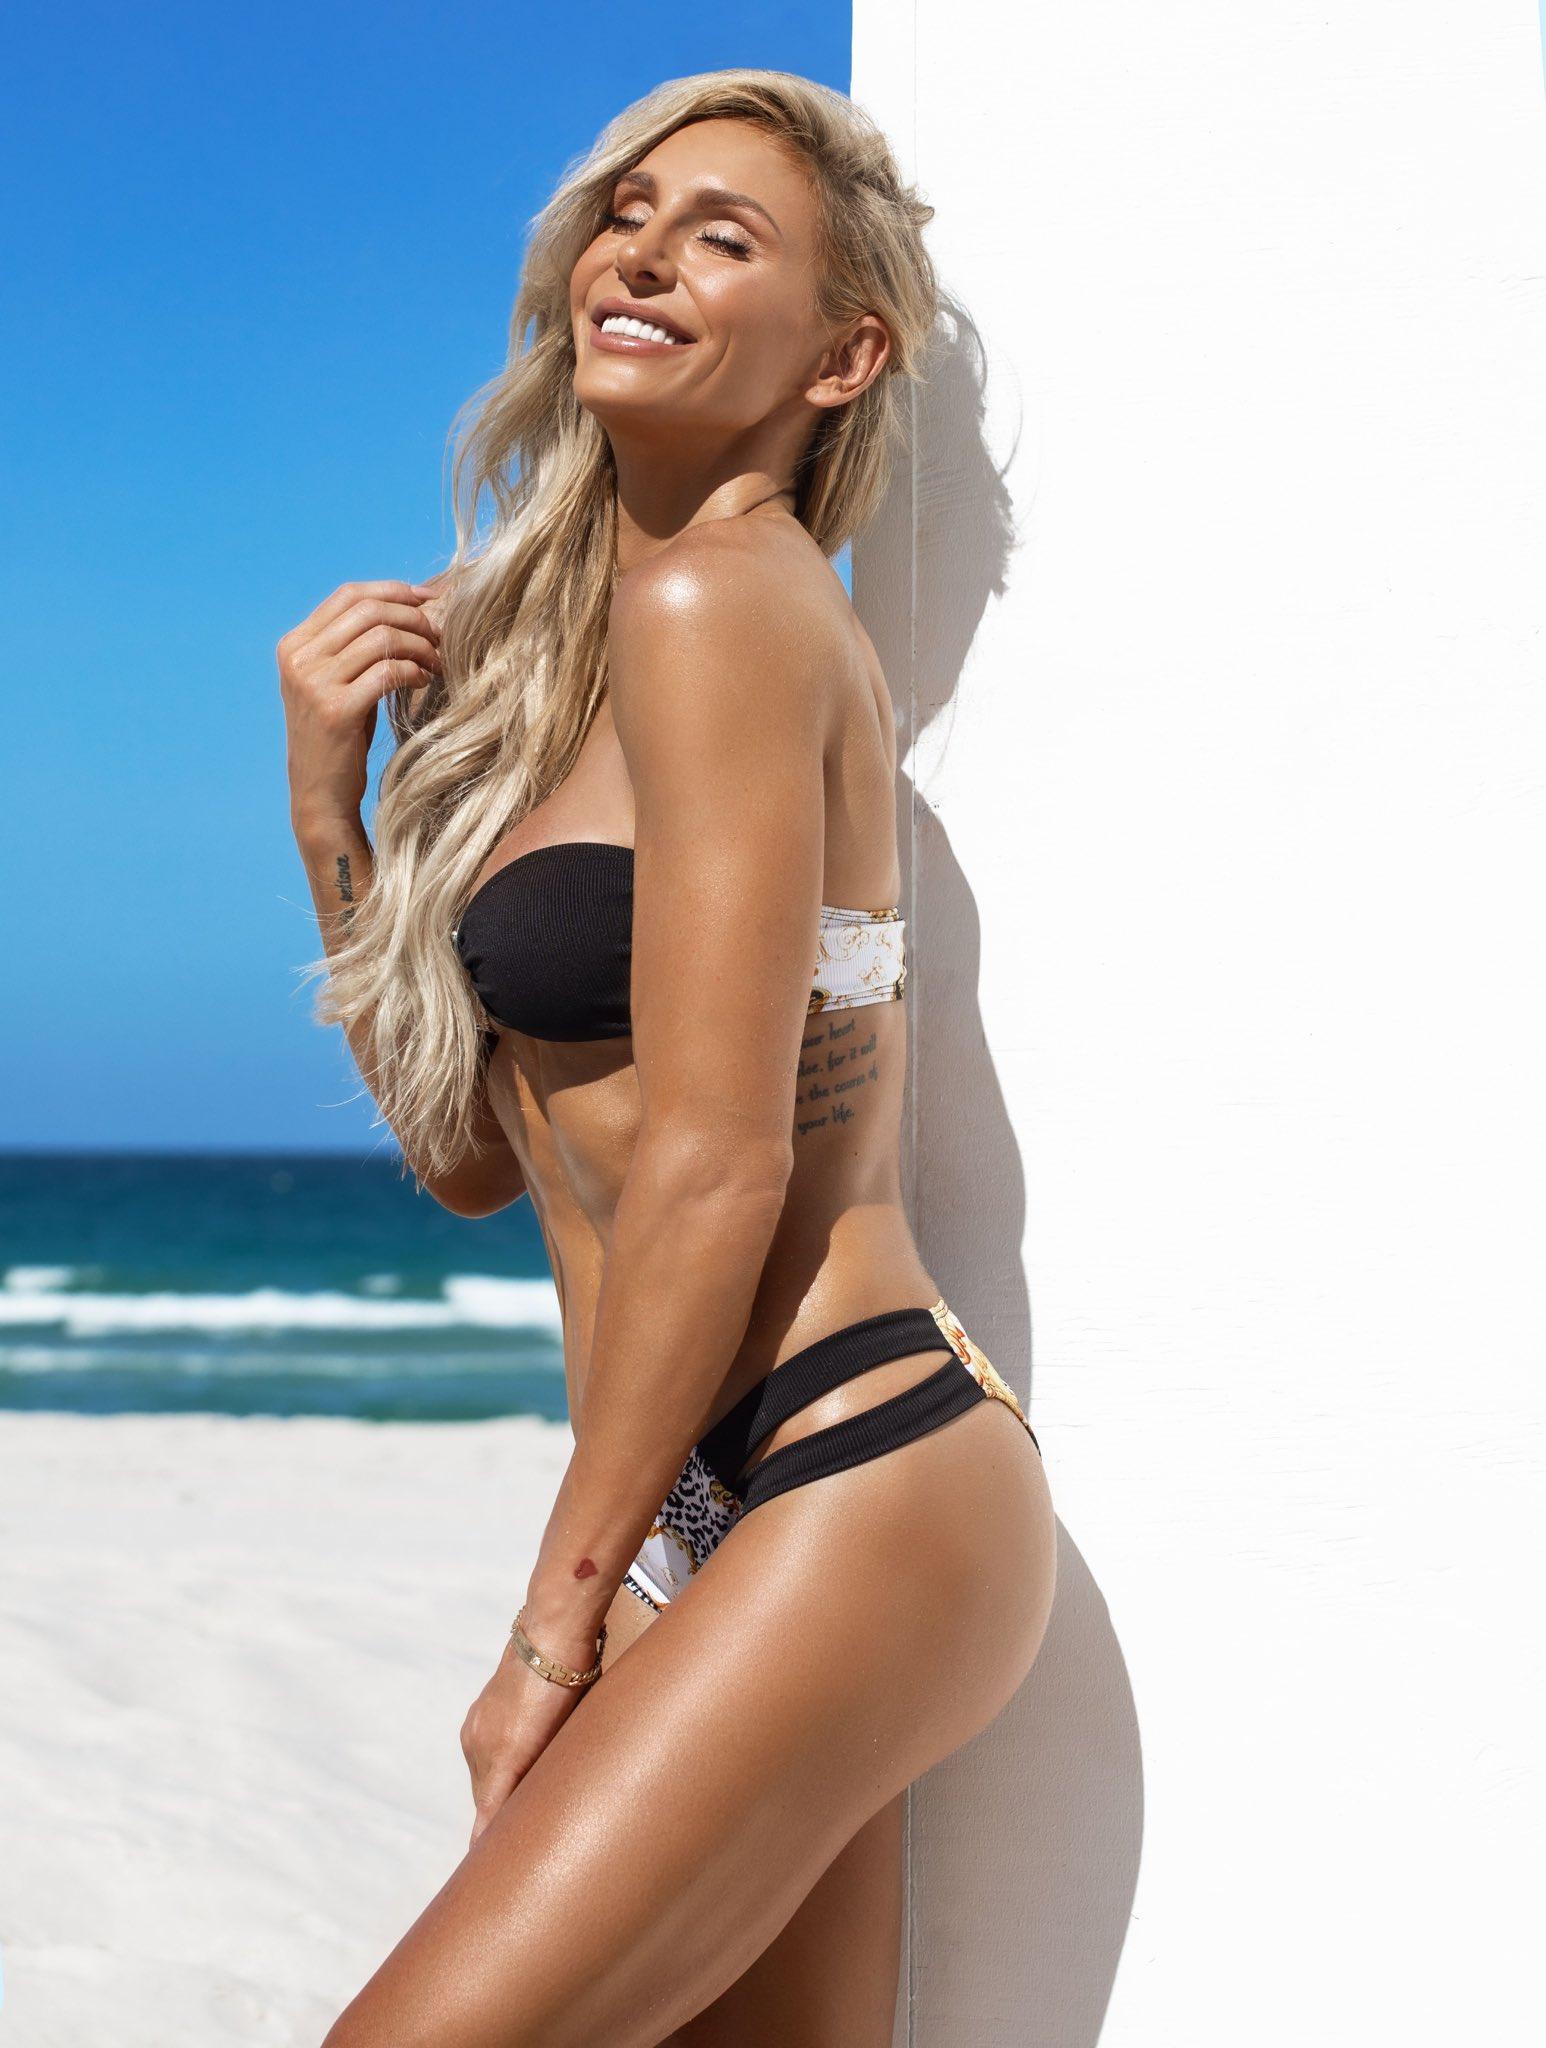 WWE Star Charlotte Flair Posts Her Latest Bikini Photo From Miami Beach 38